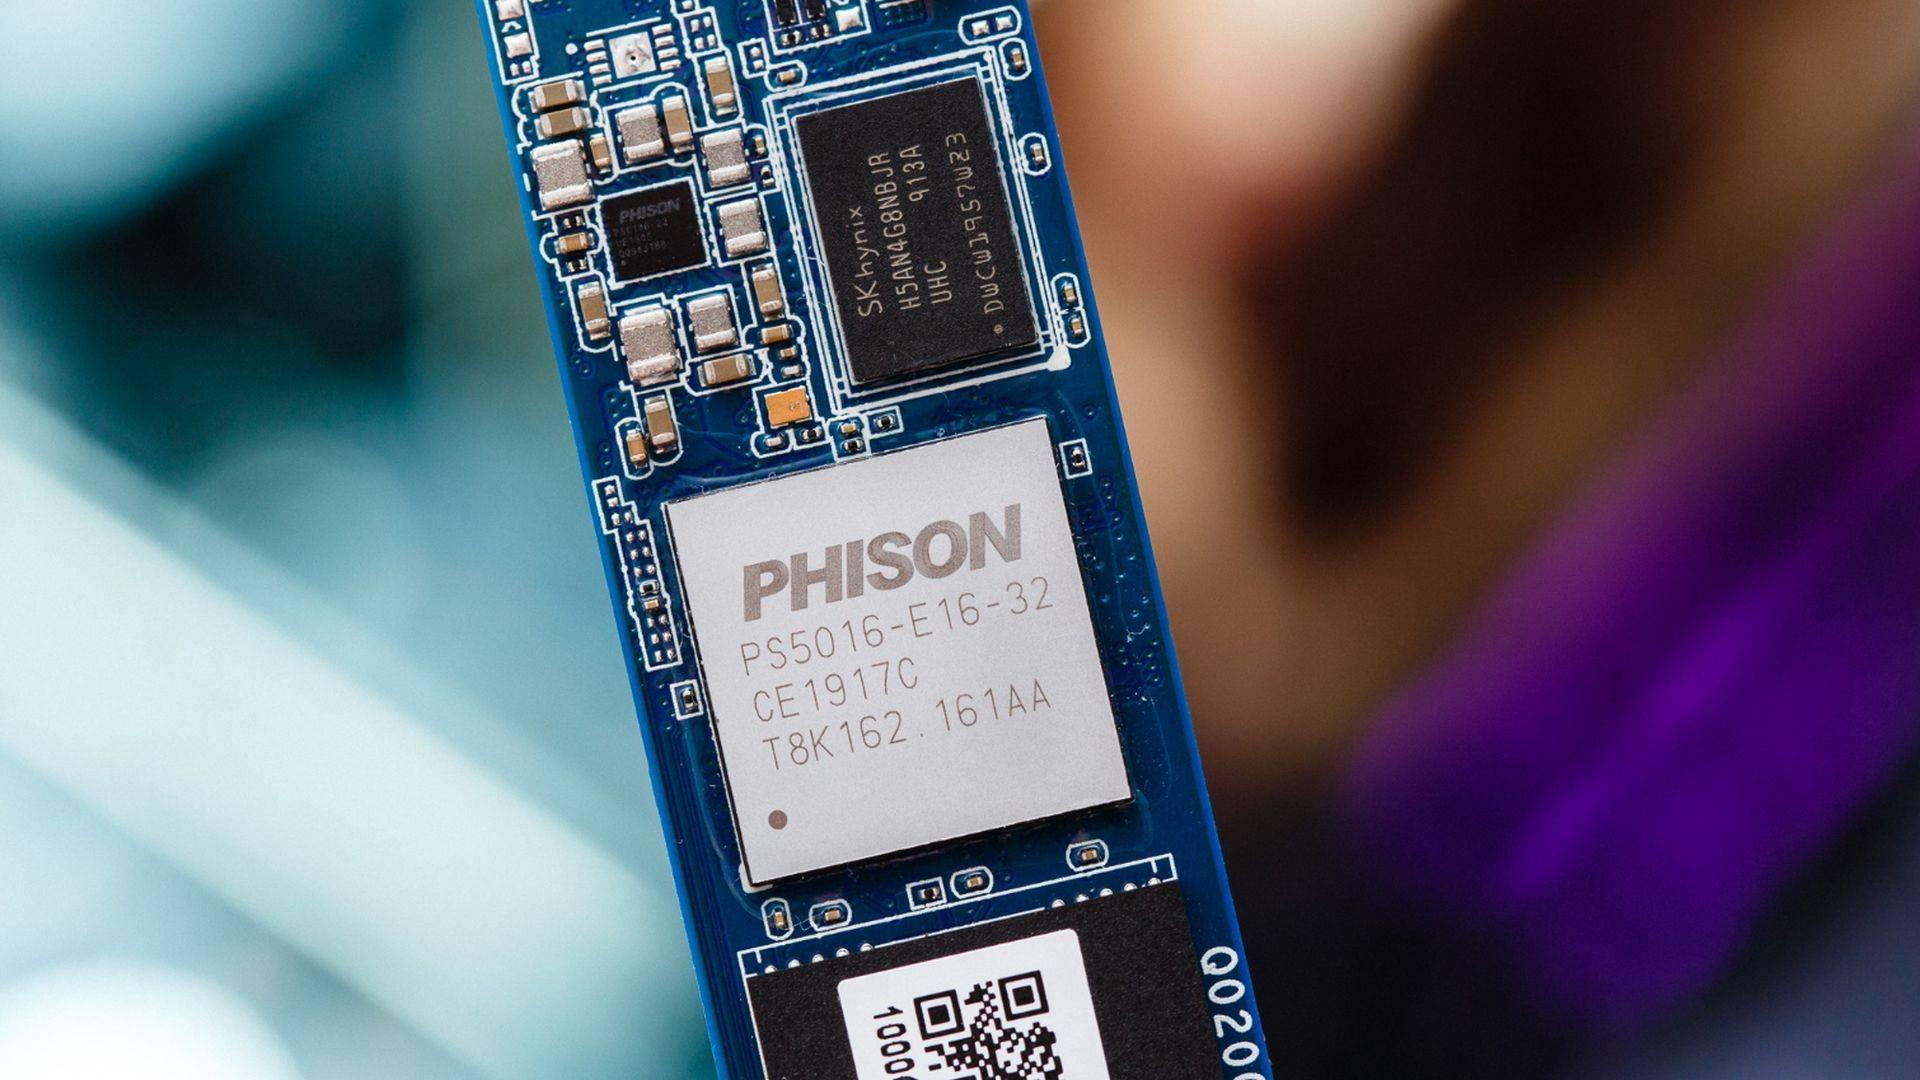 Phison E16